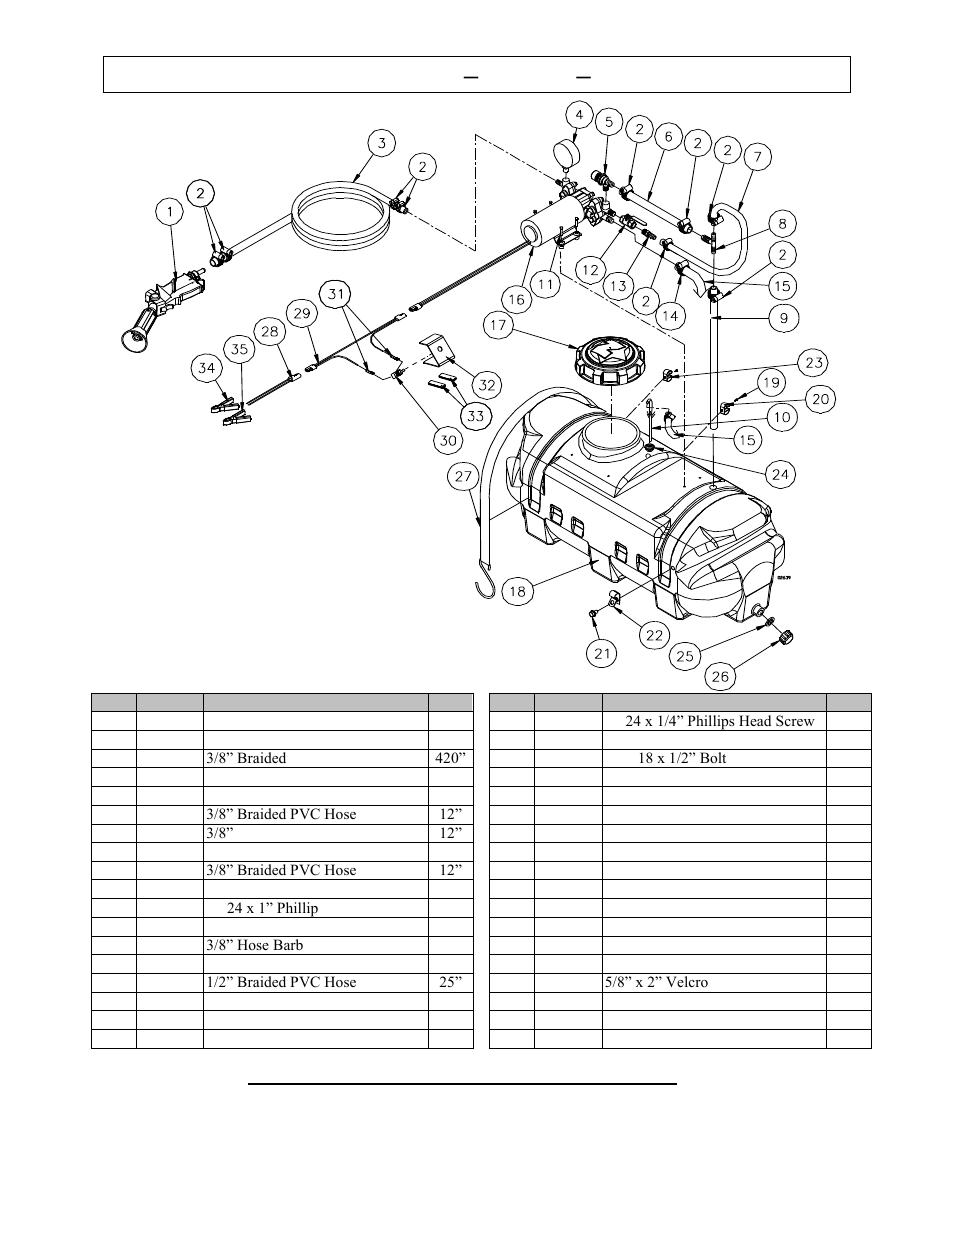 medium resolution of 165601 north star generator wiring diagram images gallery